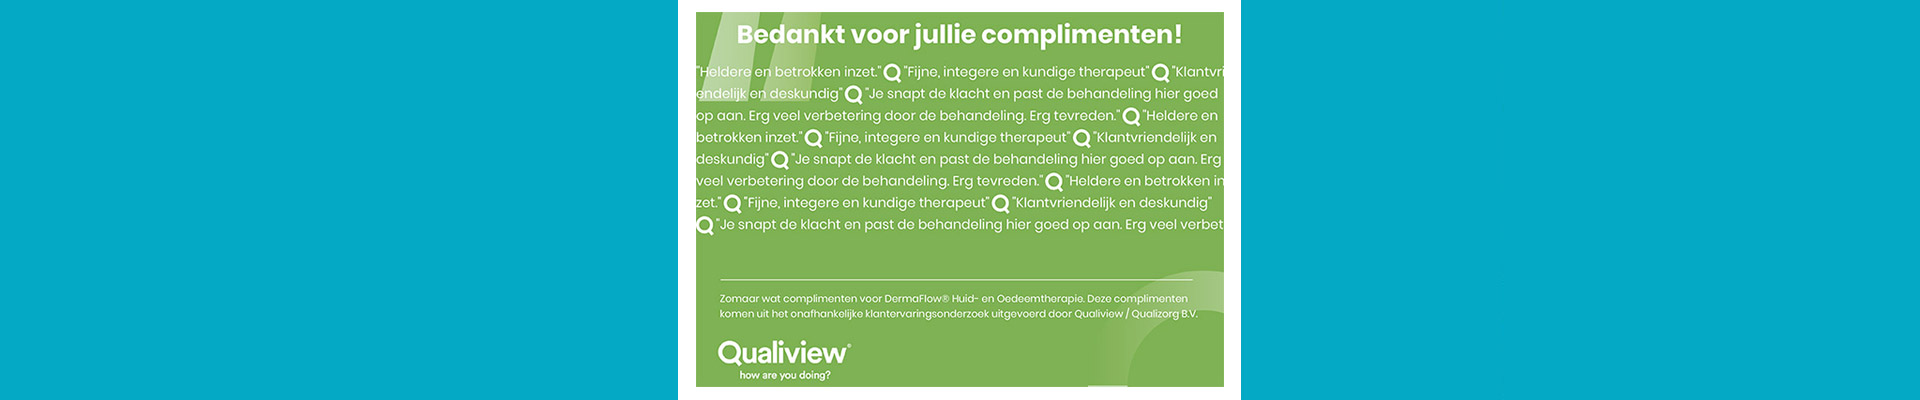 dermaflow_slider_complimenten